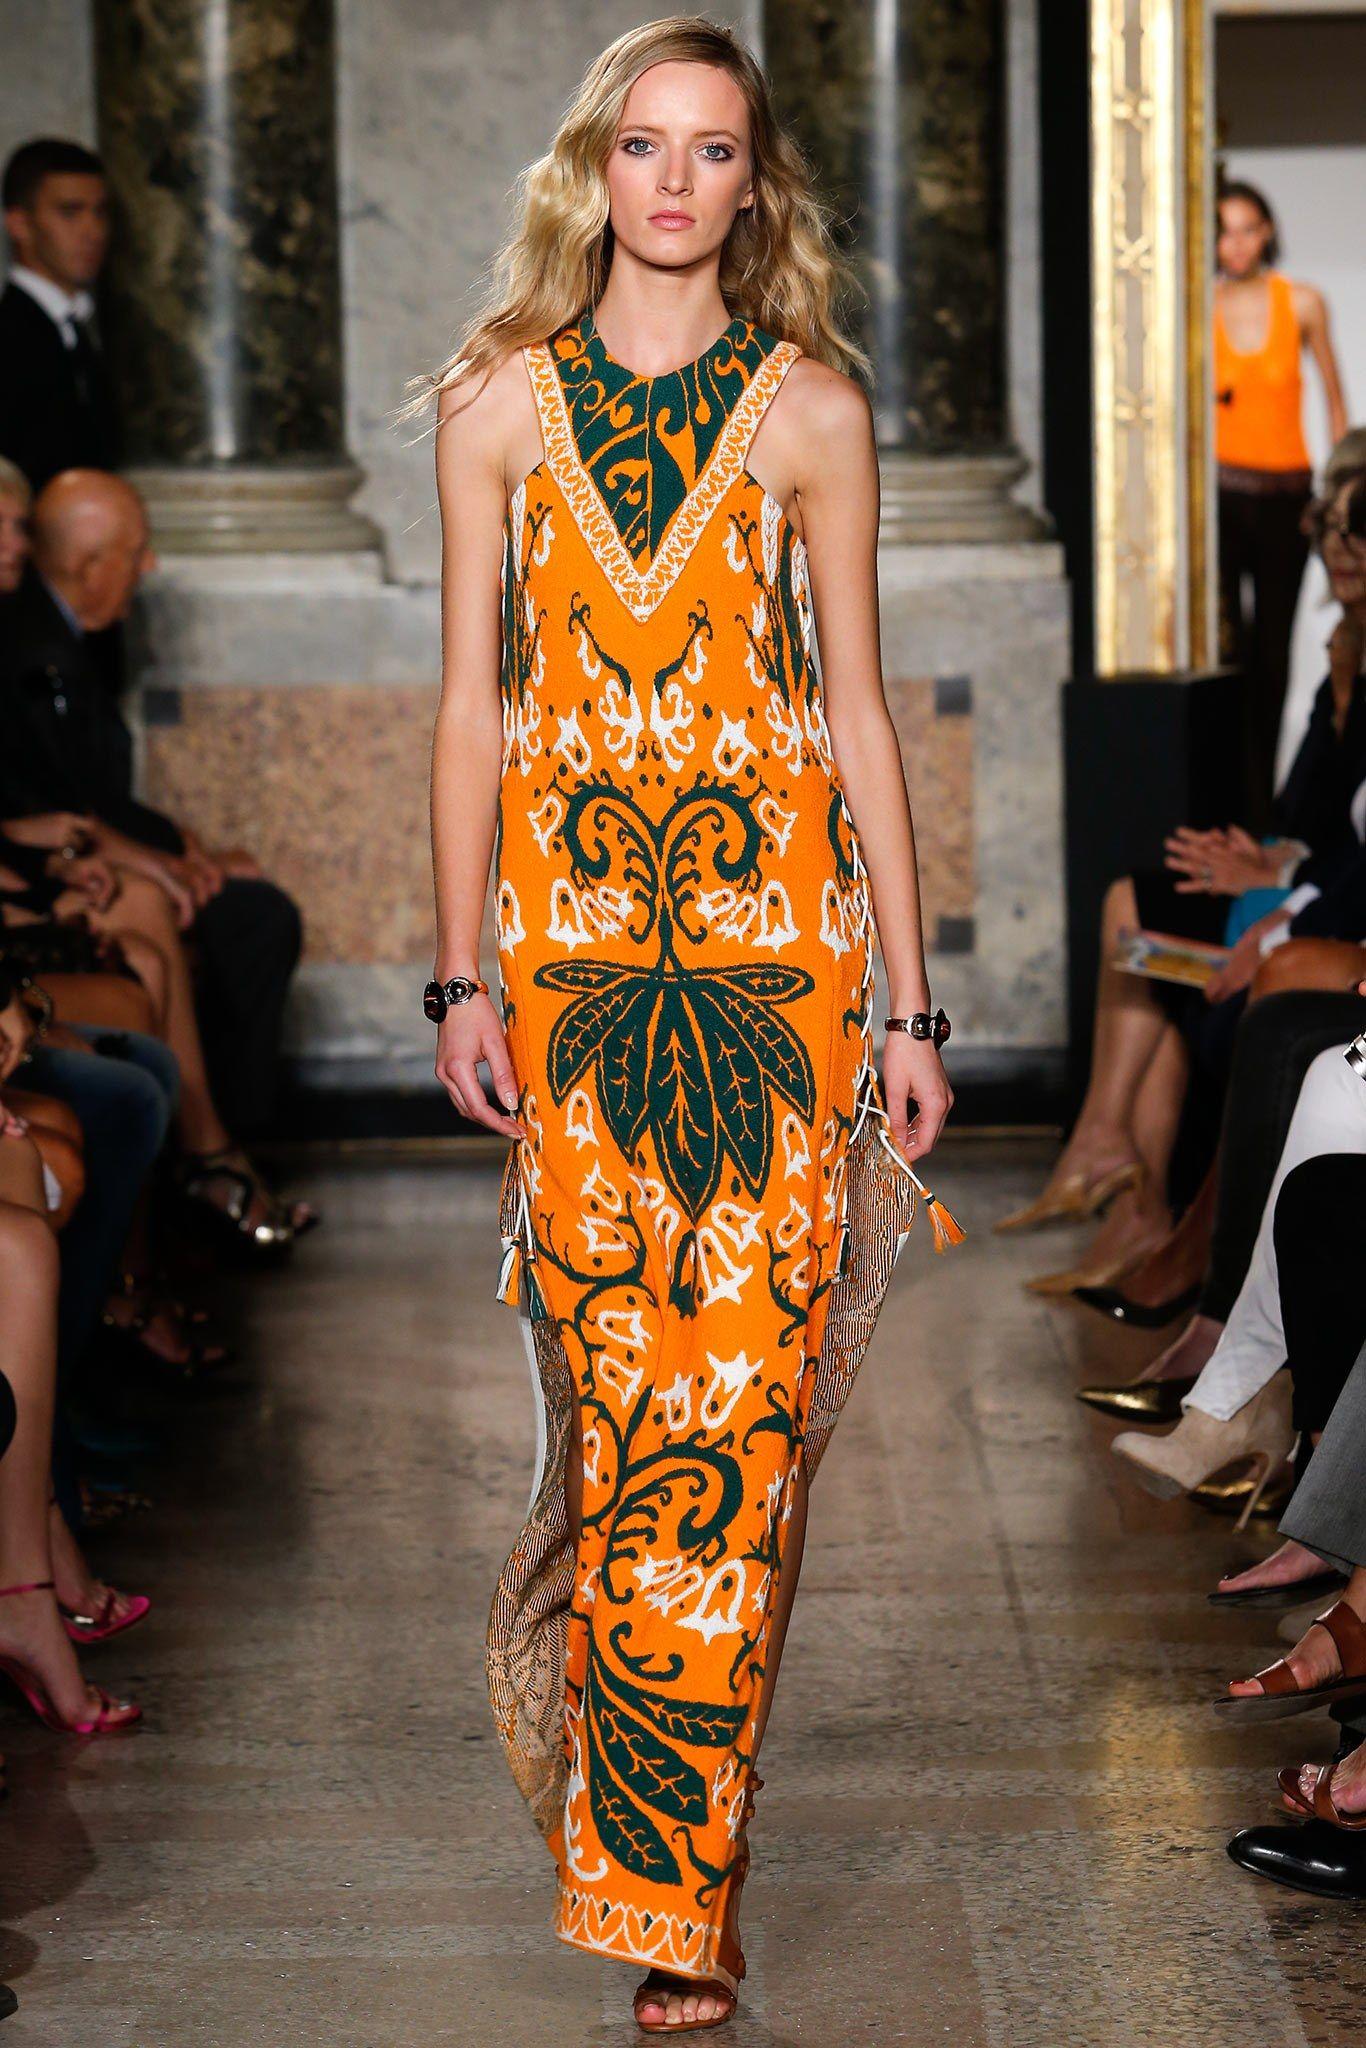 Emilio Pucci Spring 2015 Ready-to-Wear Fashion Show - Daria Strokous